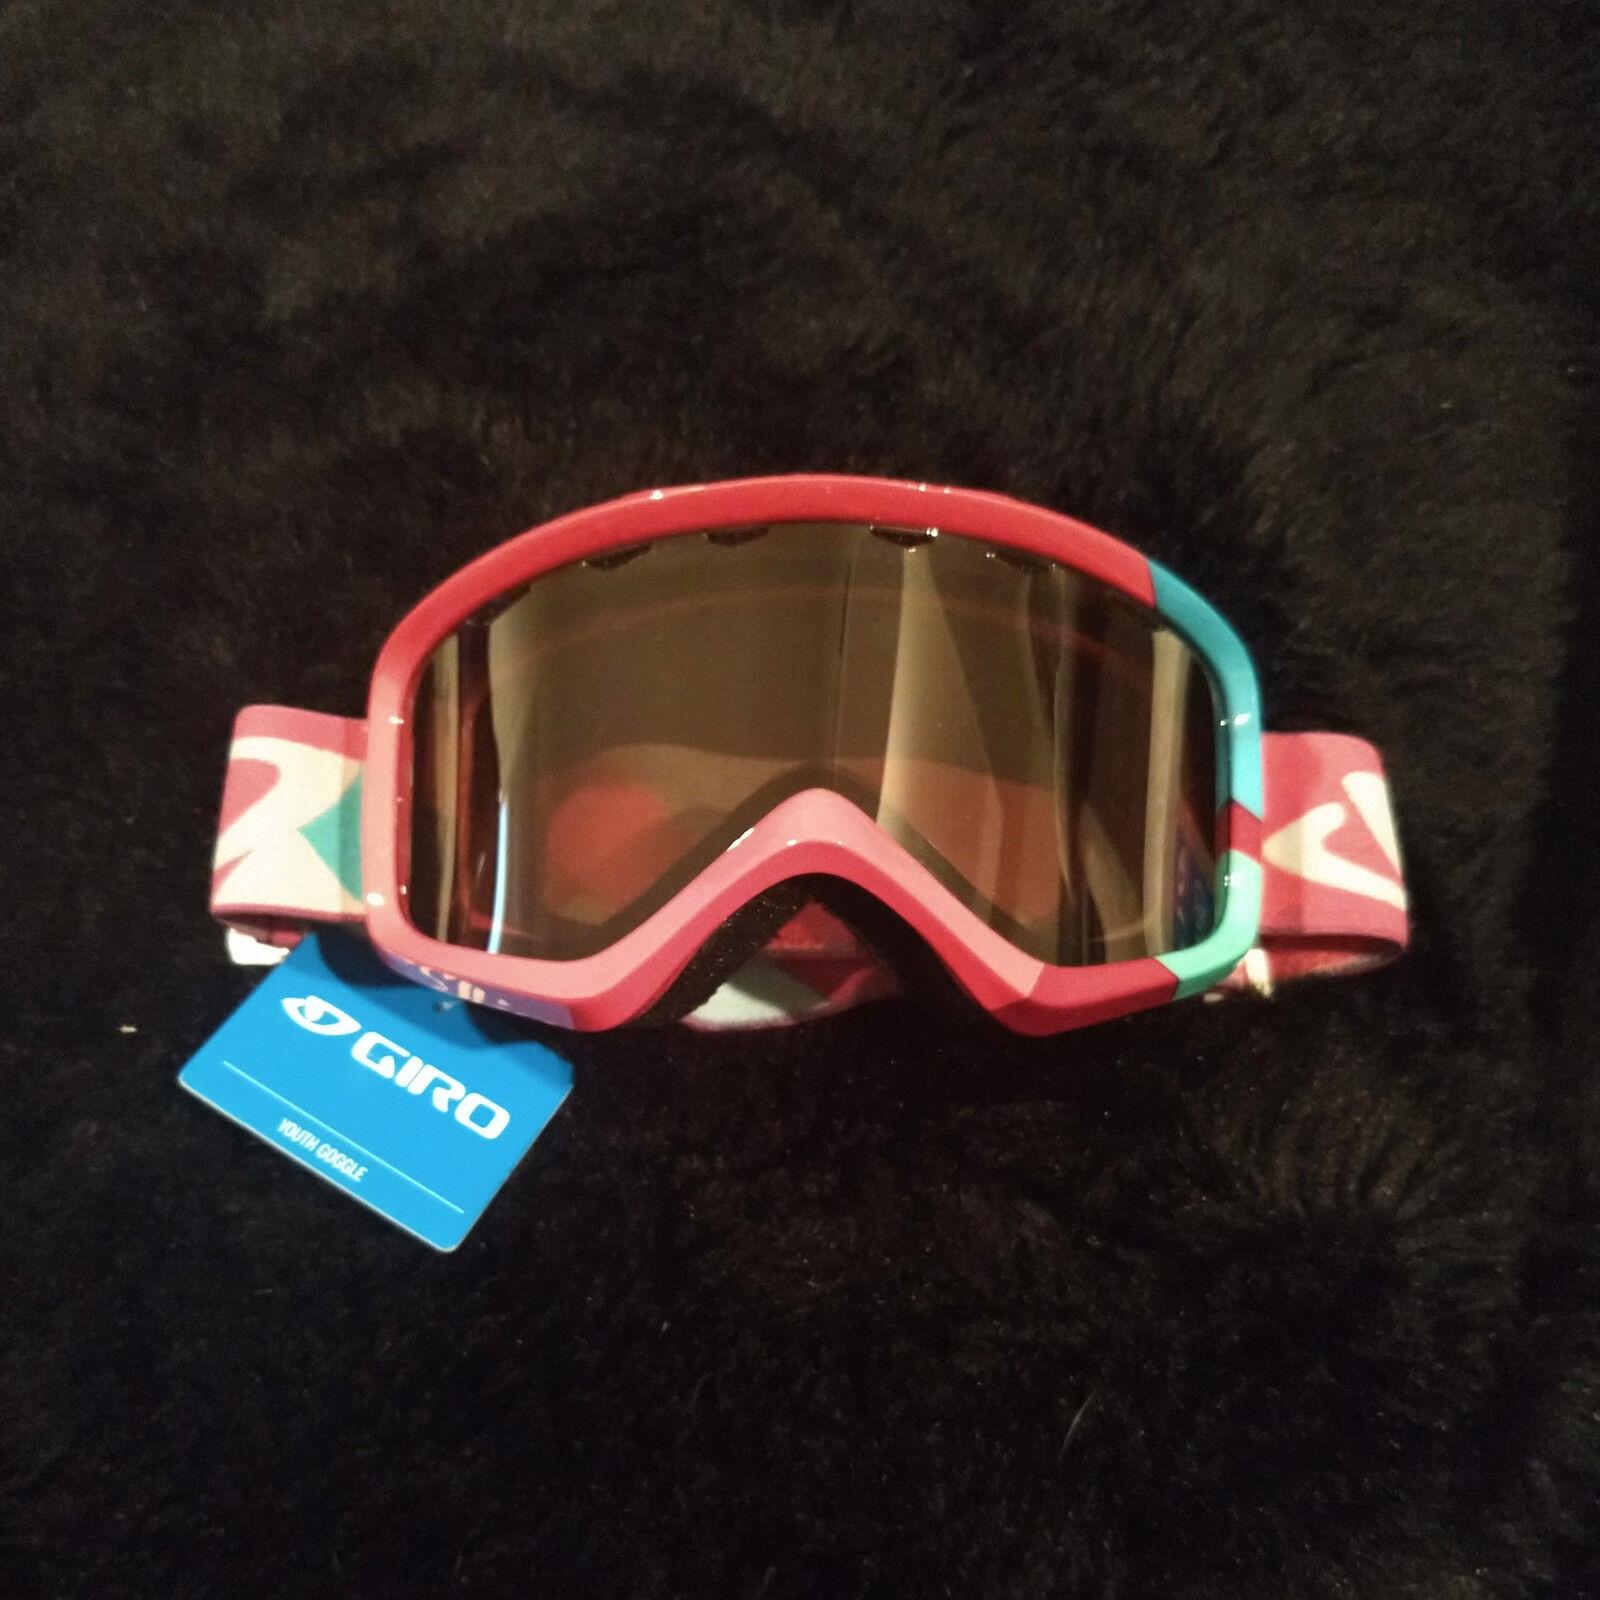 GIRO Gradeplus Youth Medium Pink Snow  Goggles - 25% OFF  fashion